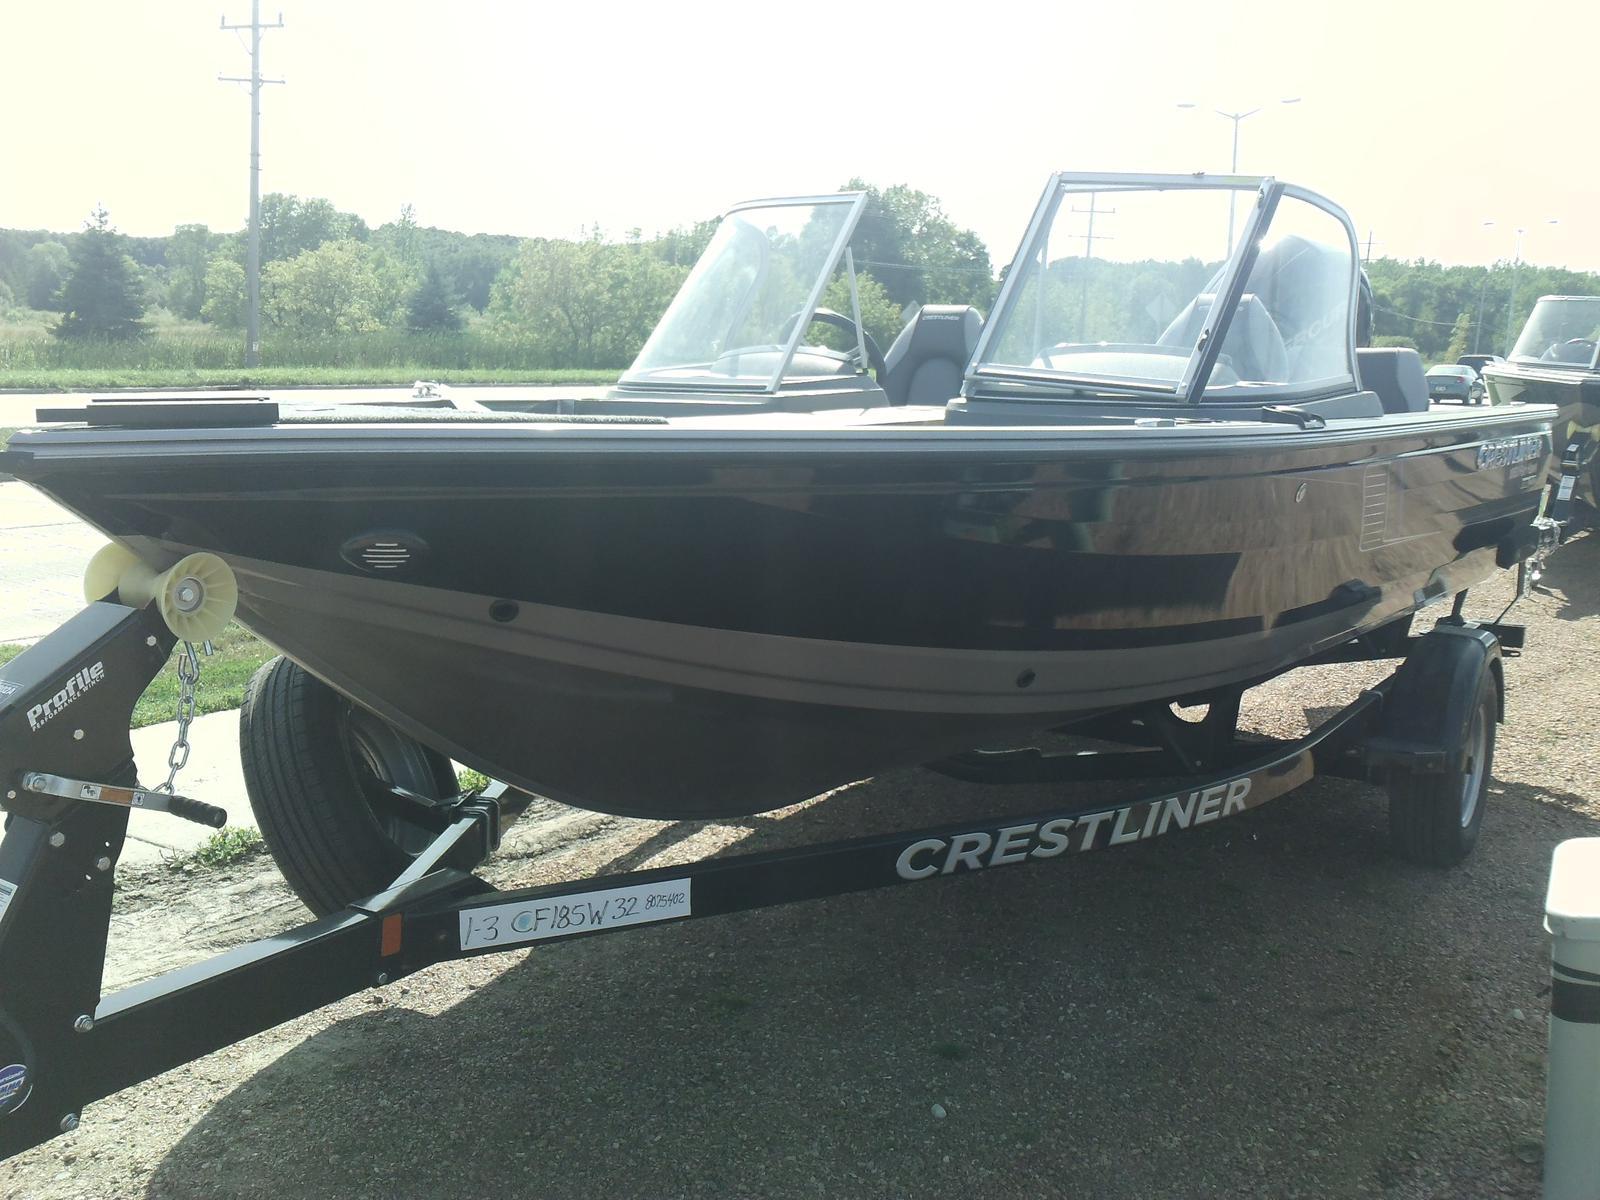 Crestliner 1850 Fish Hawk WT